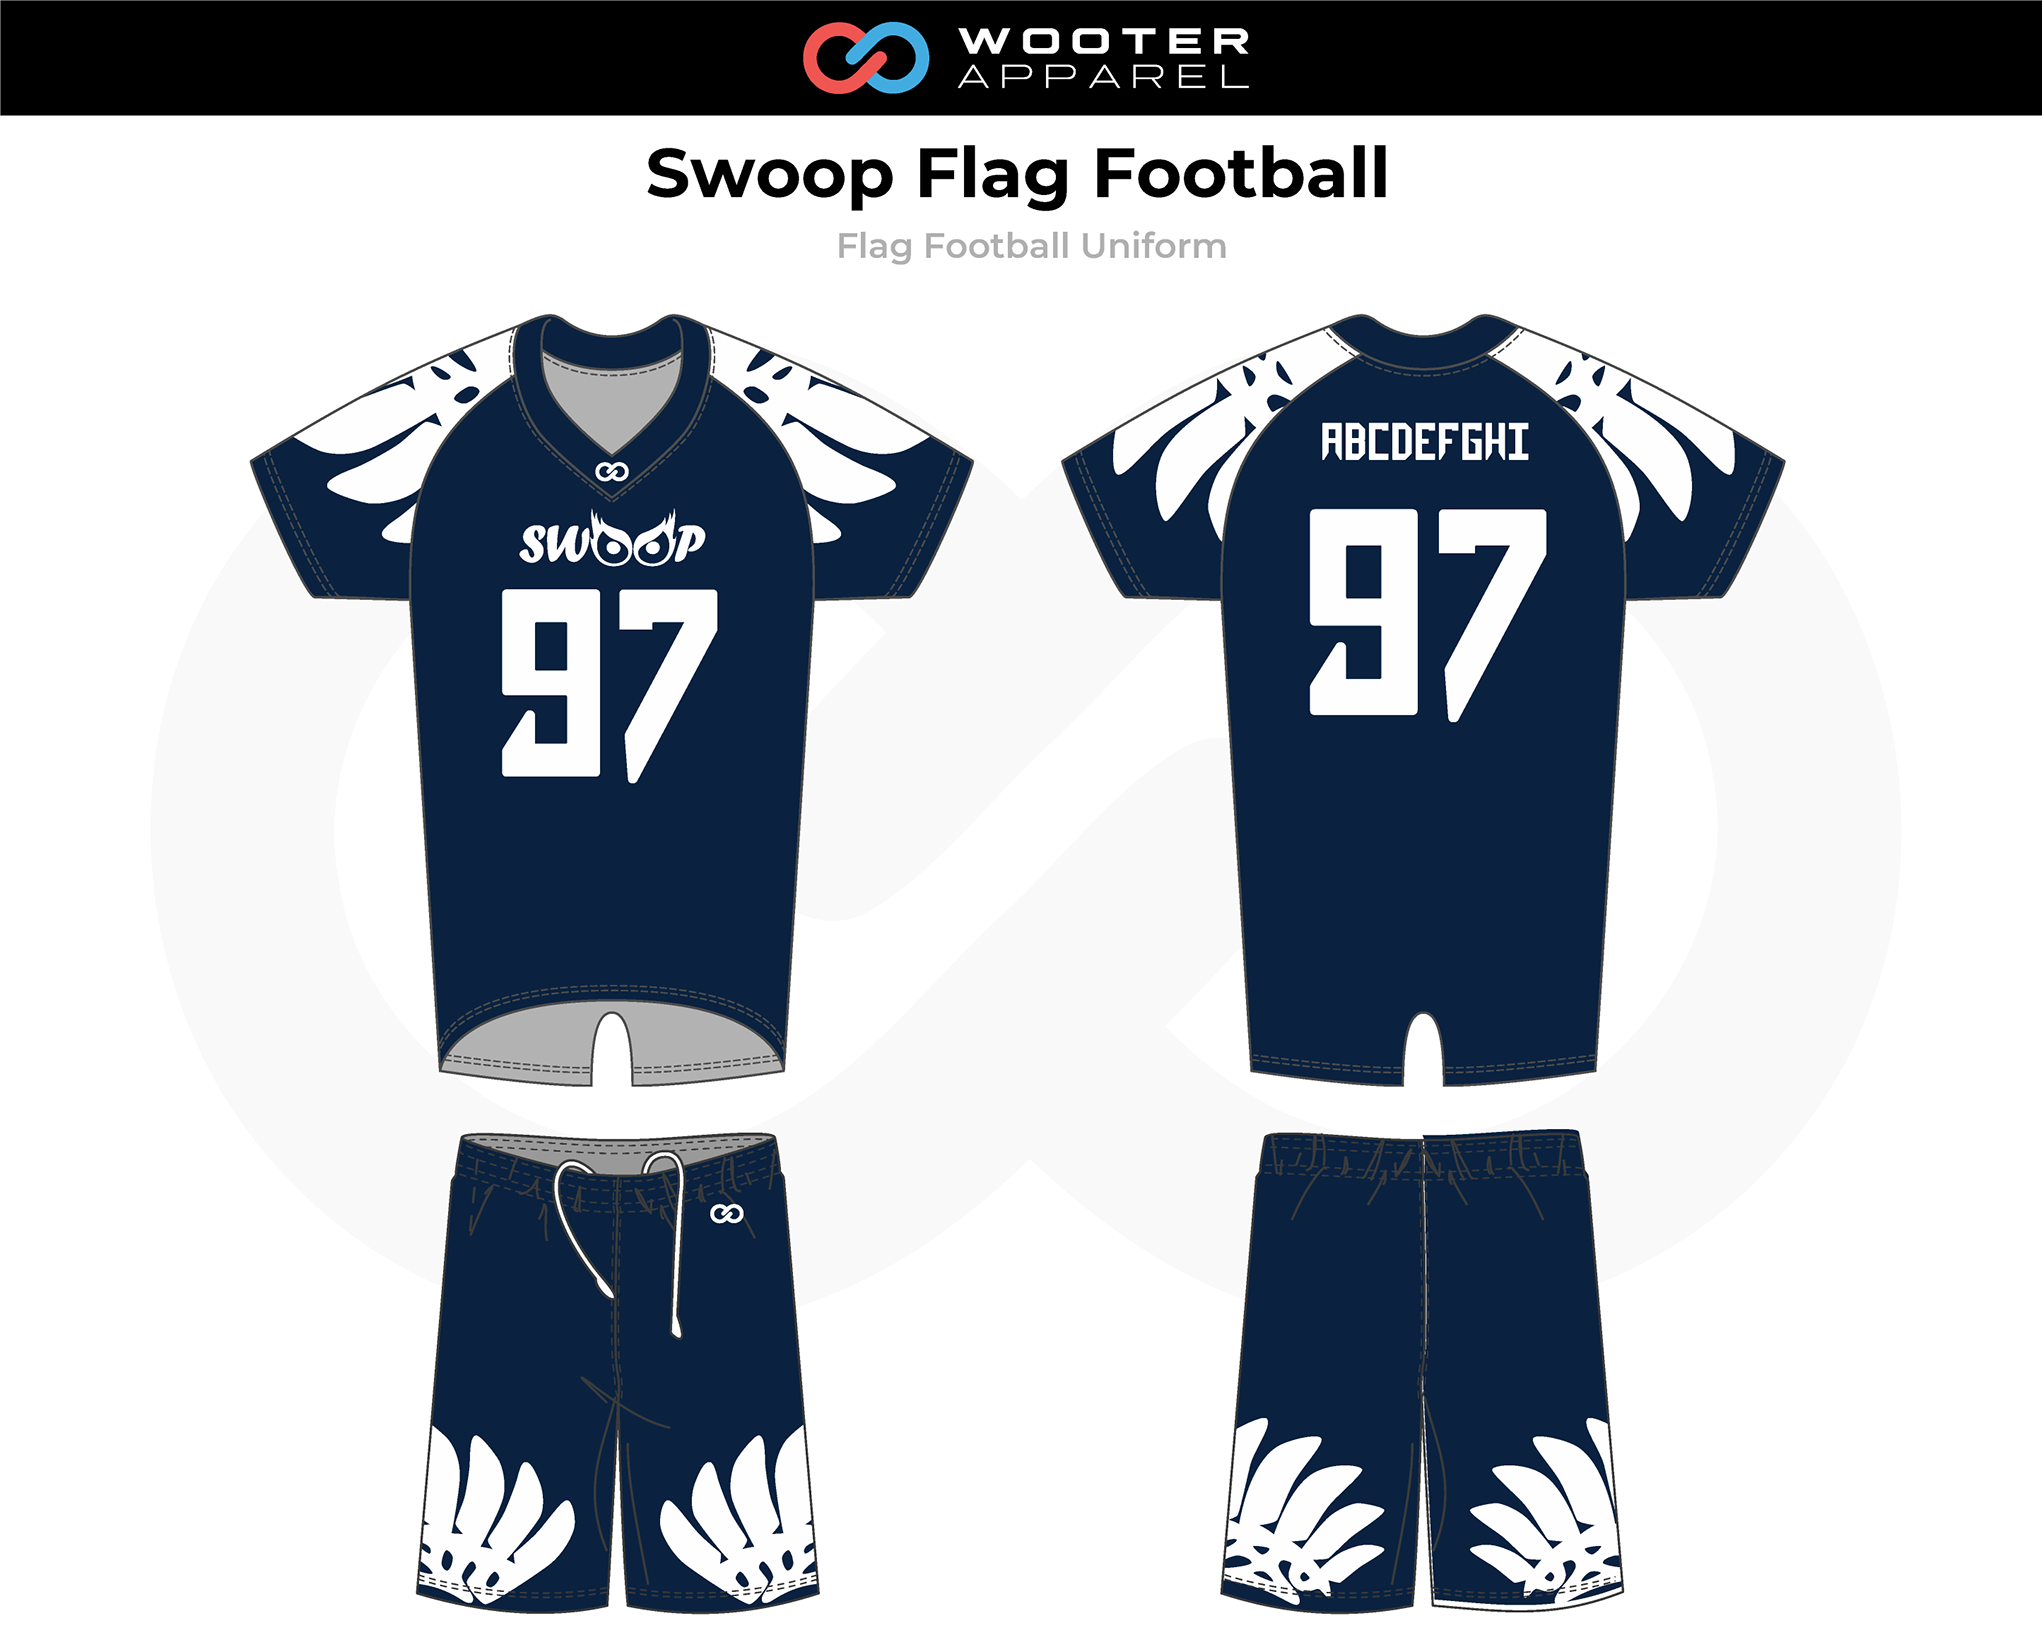 2019-02-12 Swoop Flag Football Uniform (Oregon).png